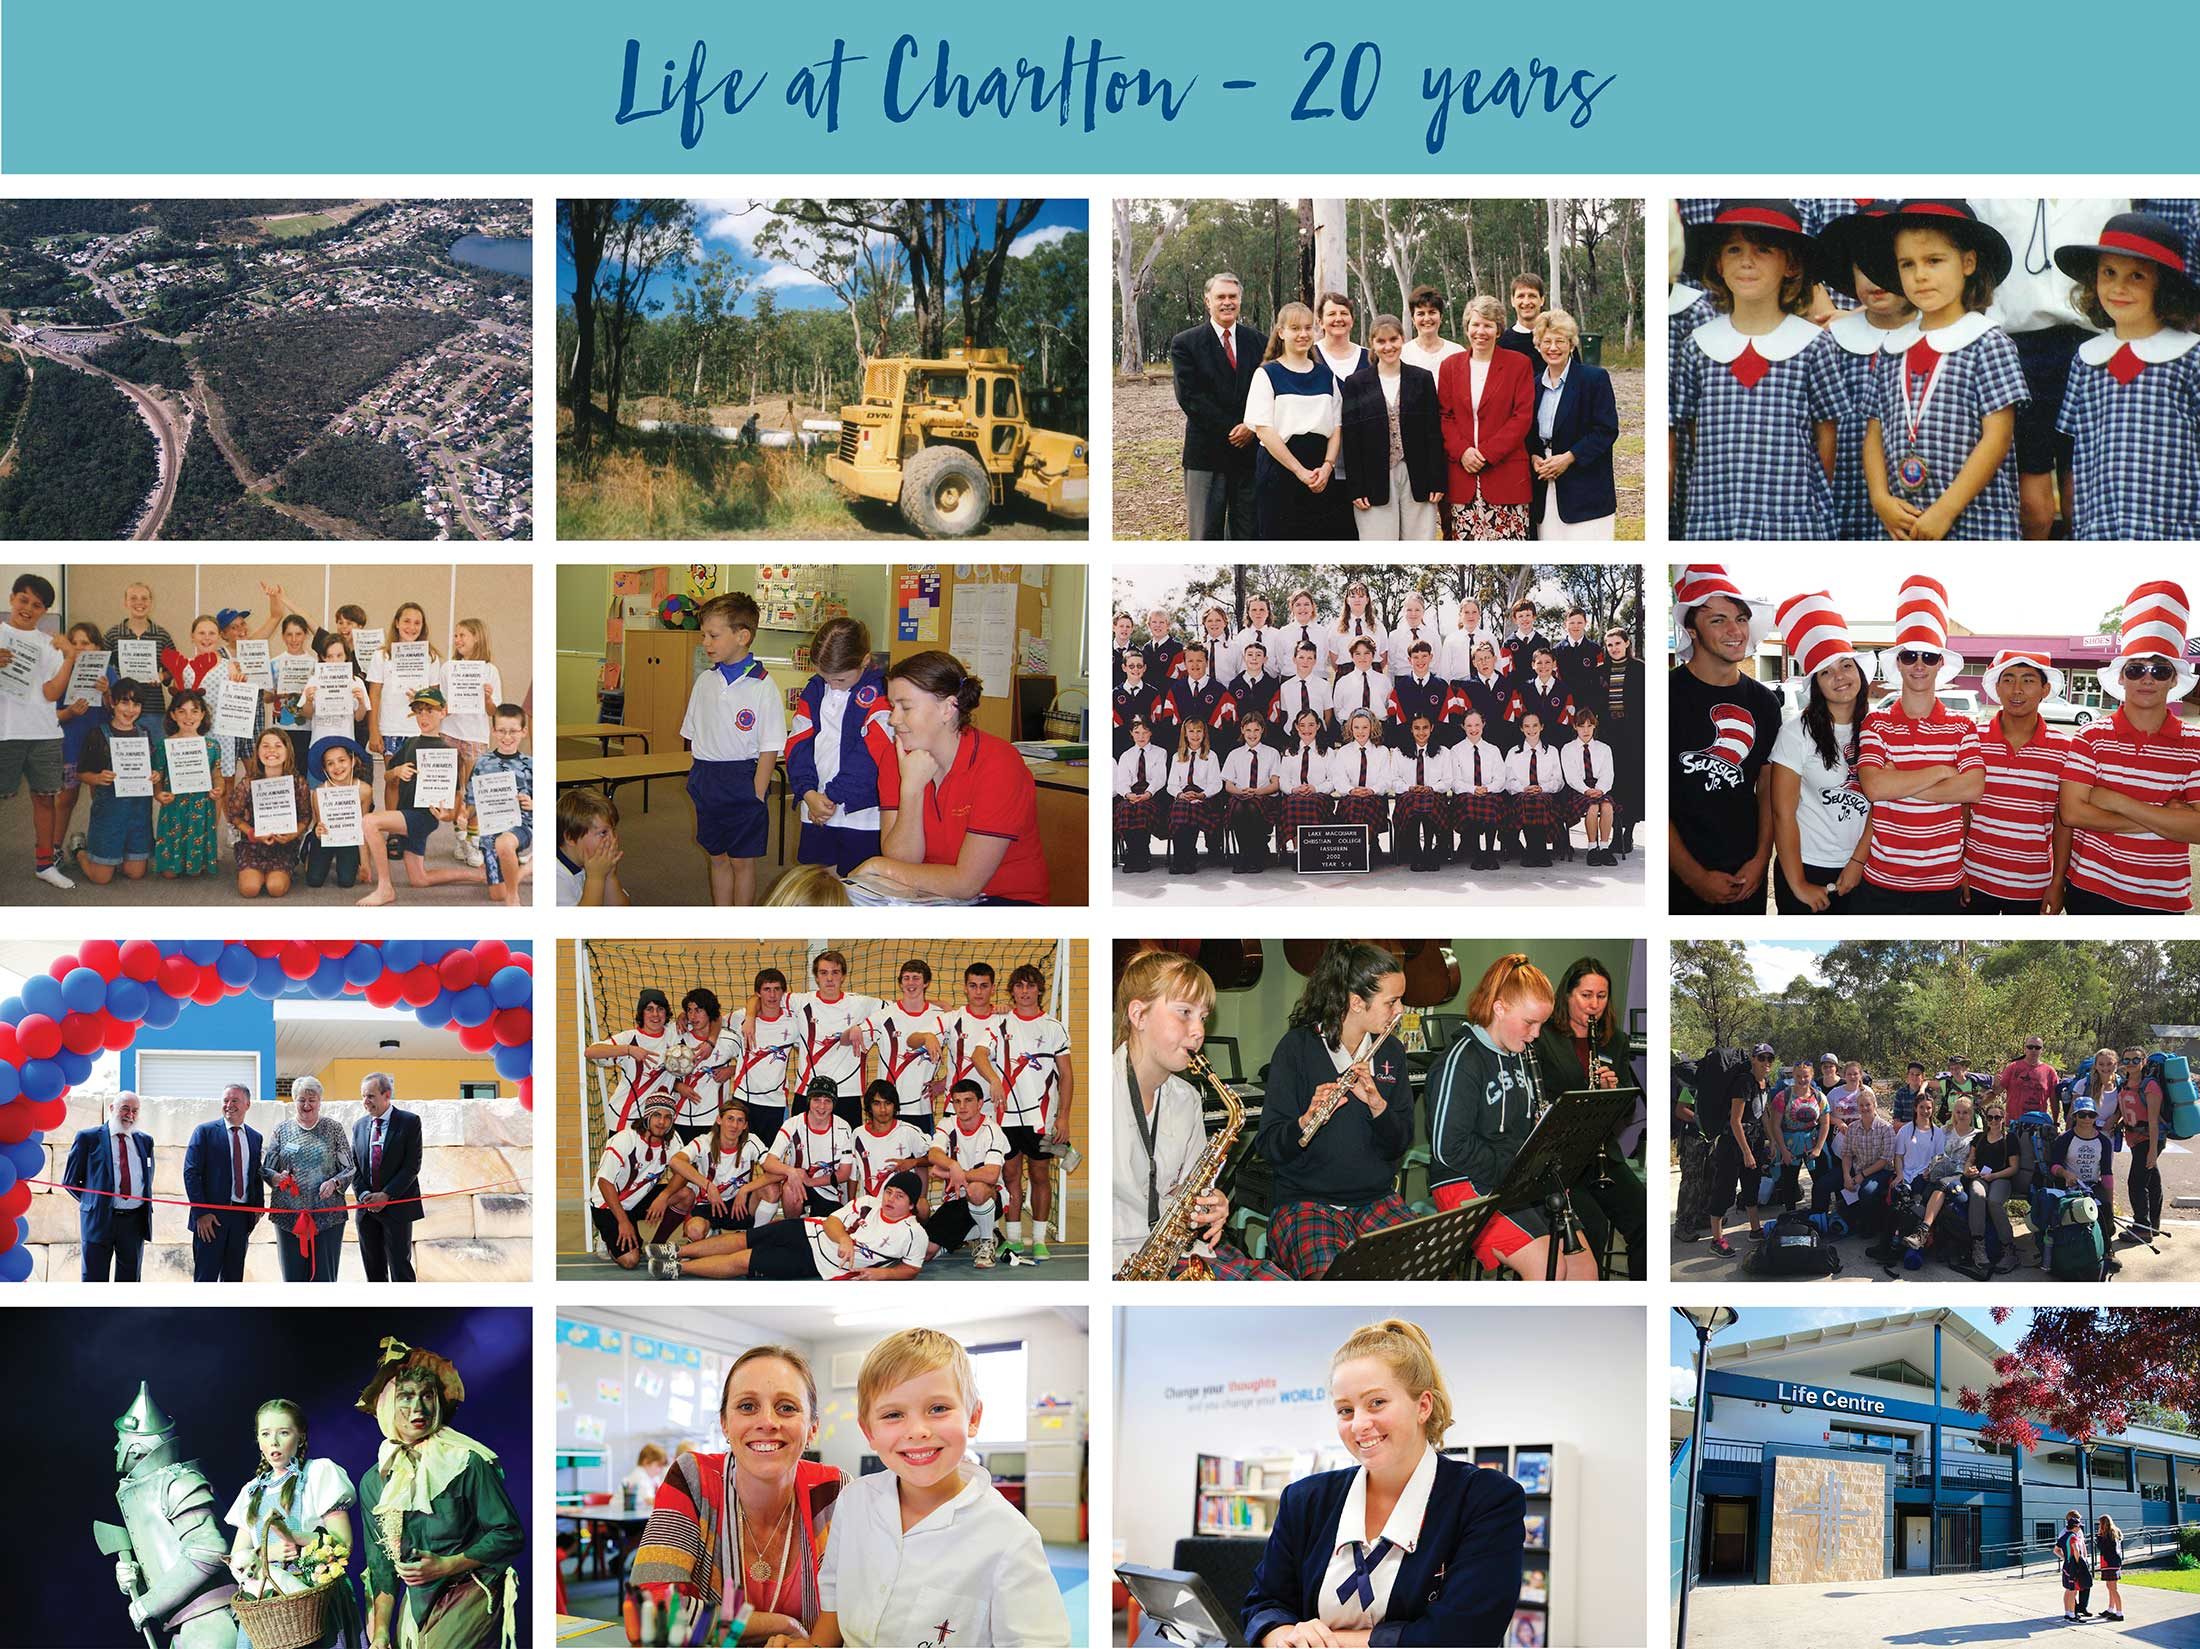 charlton christian college turns 20